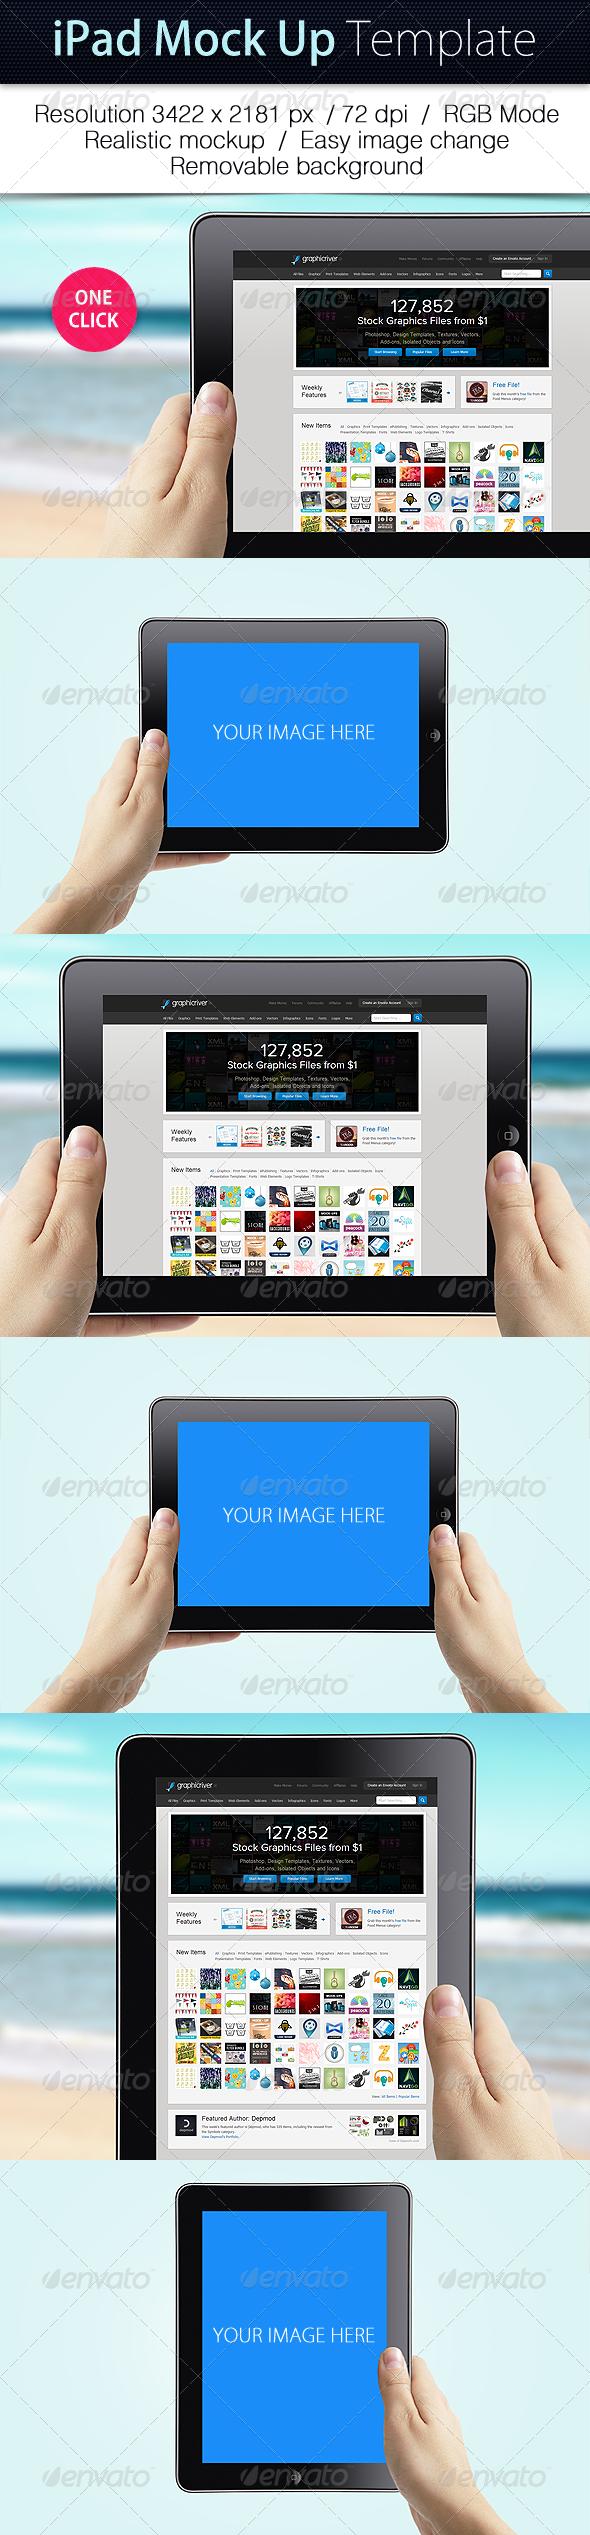 GraphicRiver iPad Mockup Template 5060766